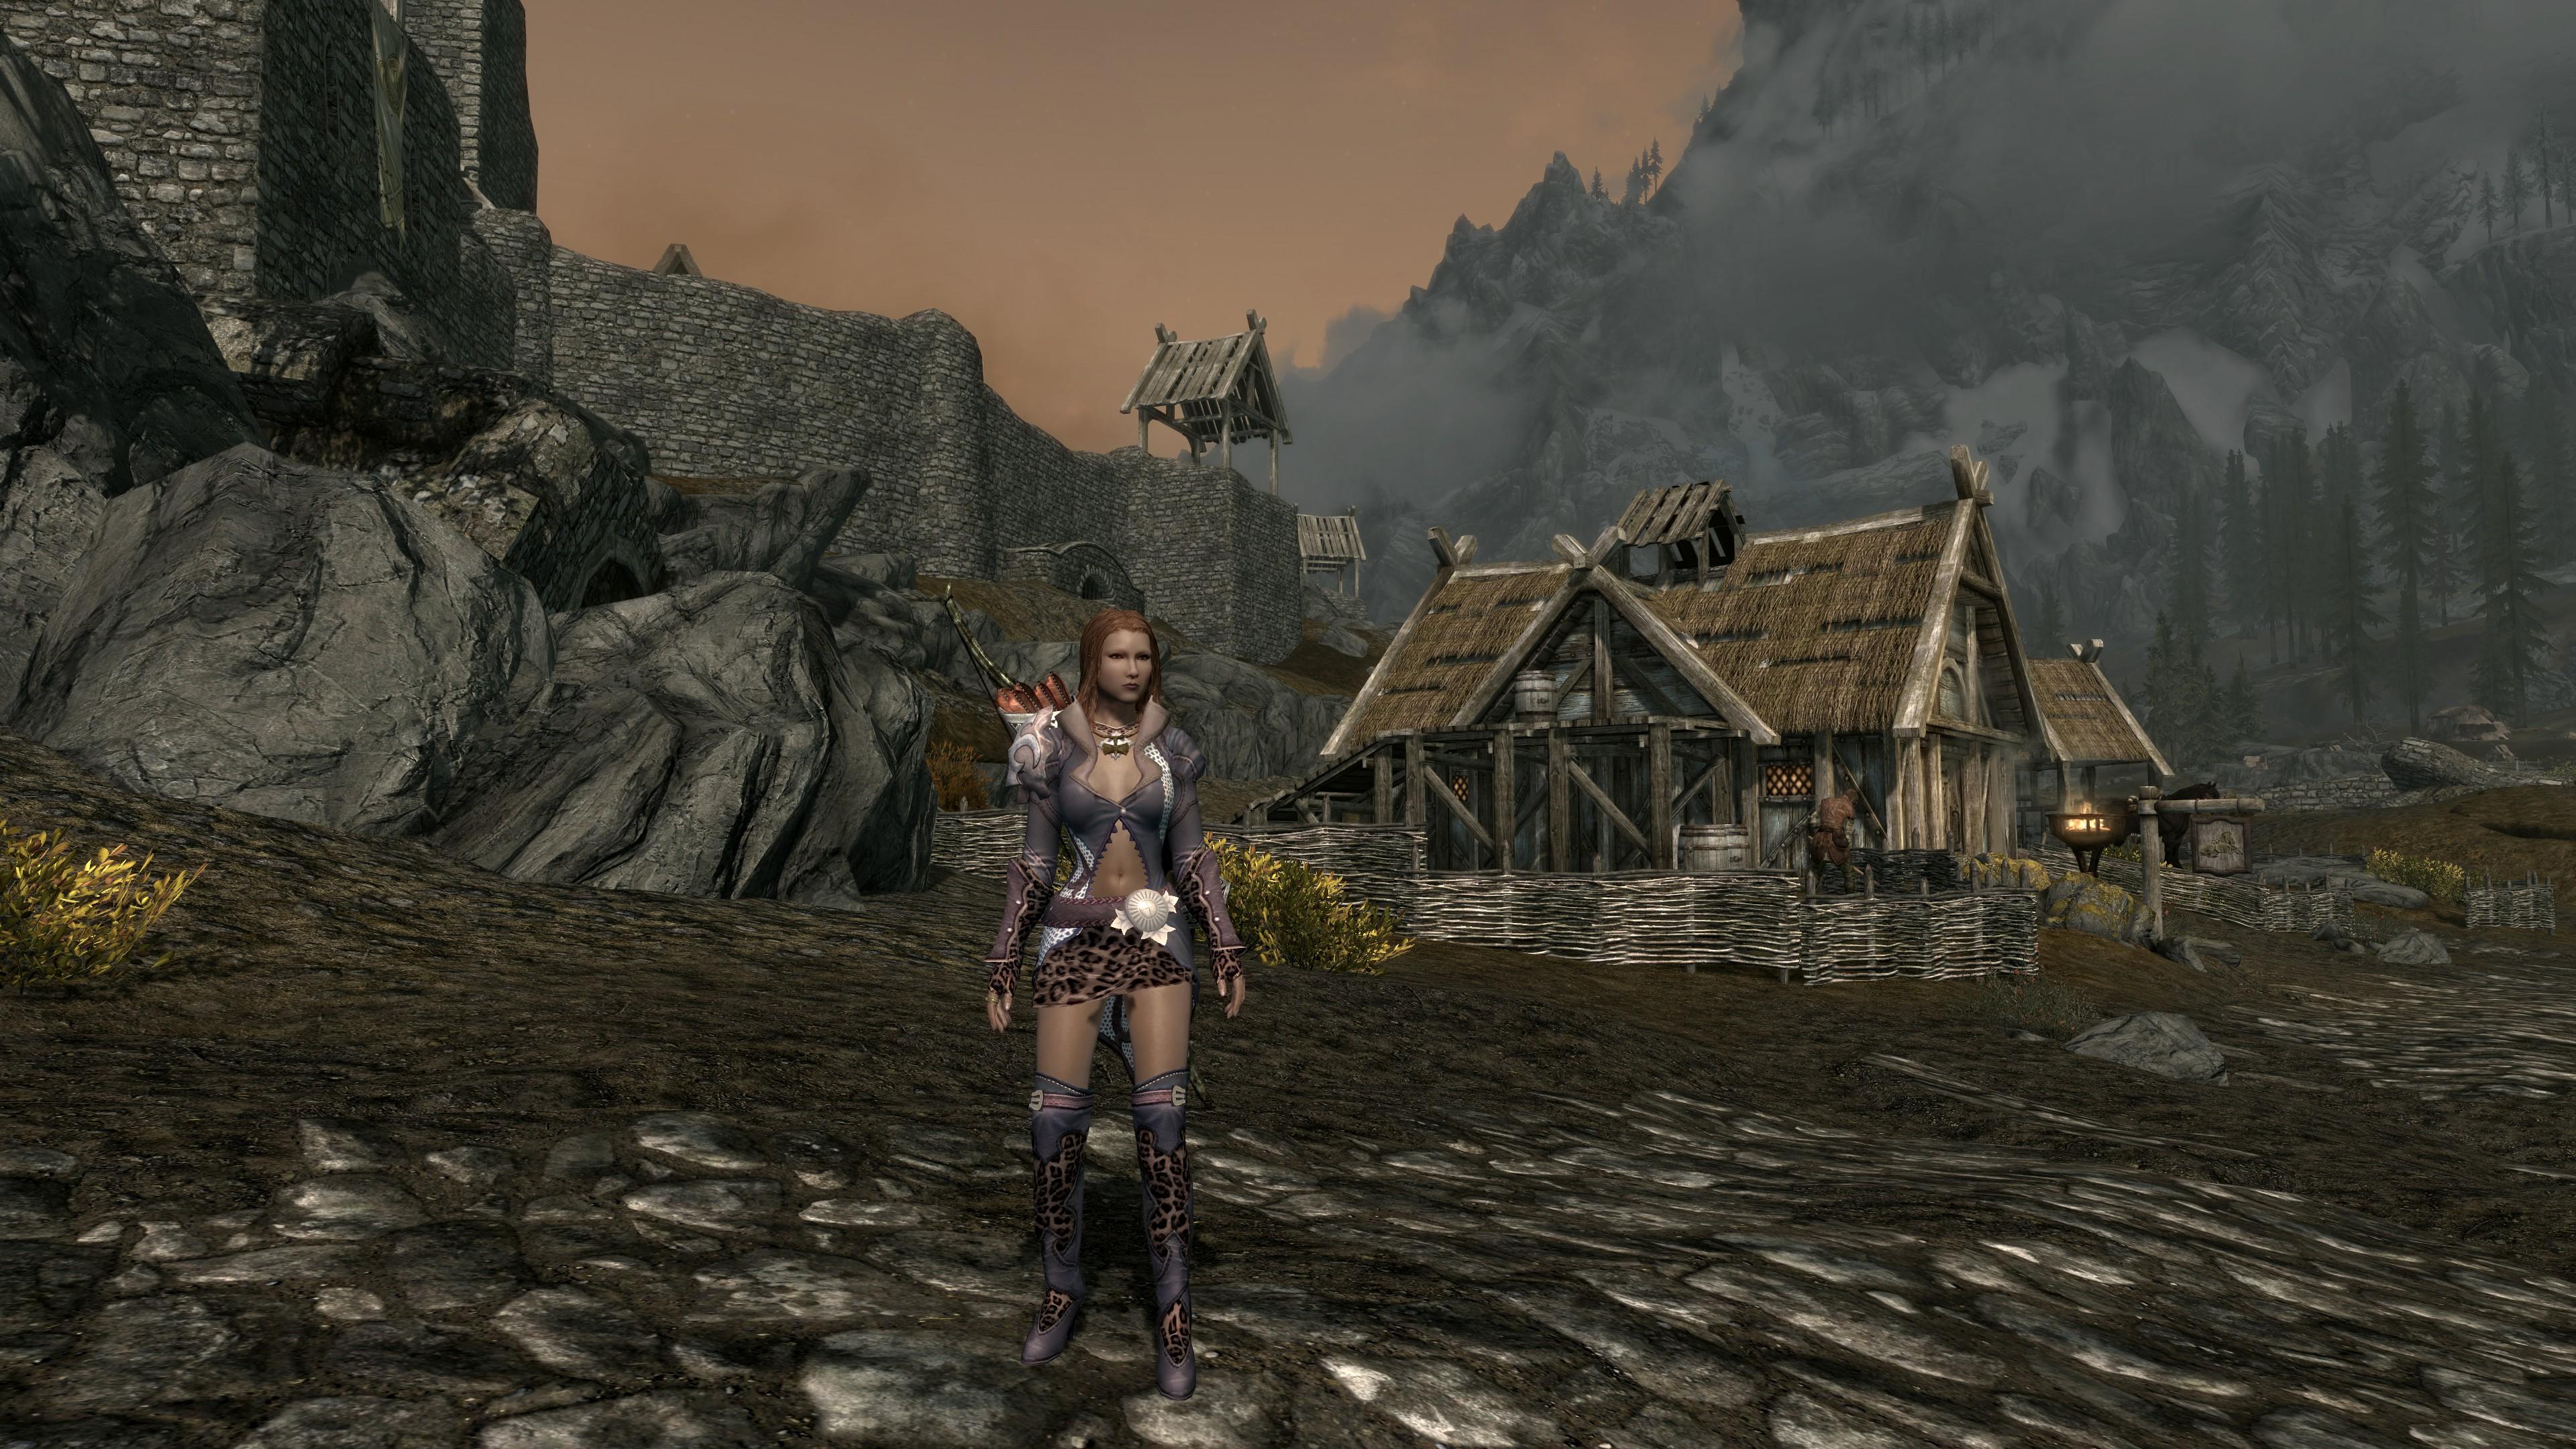 The Elder Scrolls V: Skyrim скриншоты из игры в 4к - Elder Scrolls 5: Skyrim, the 4K, Мод